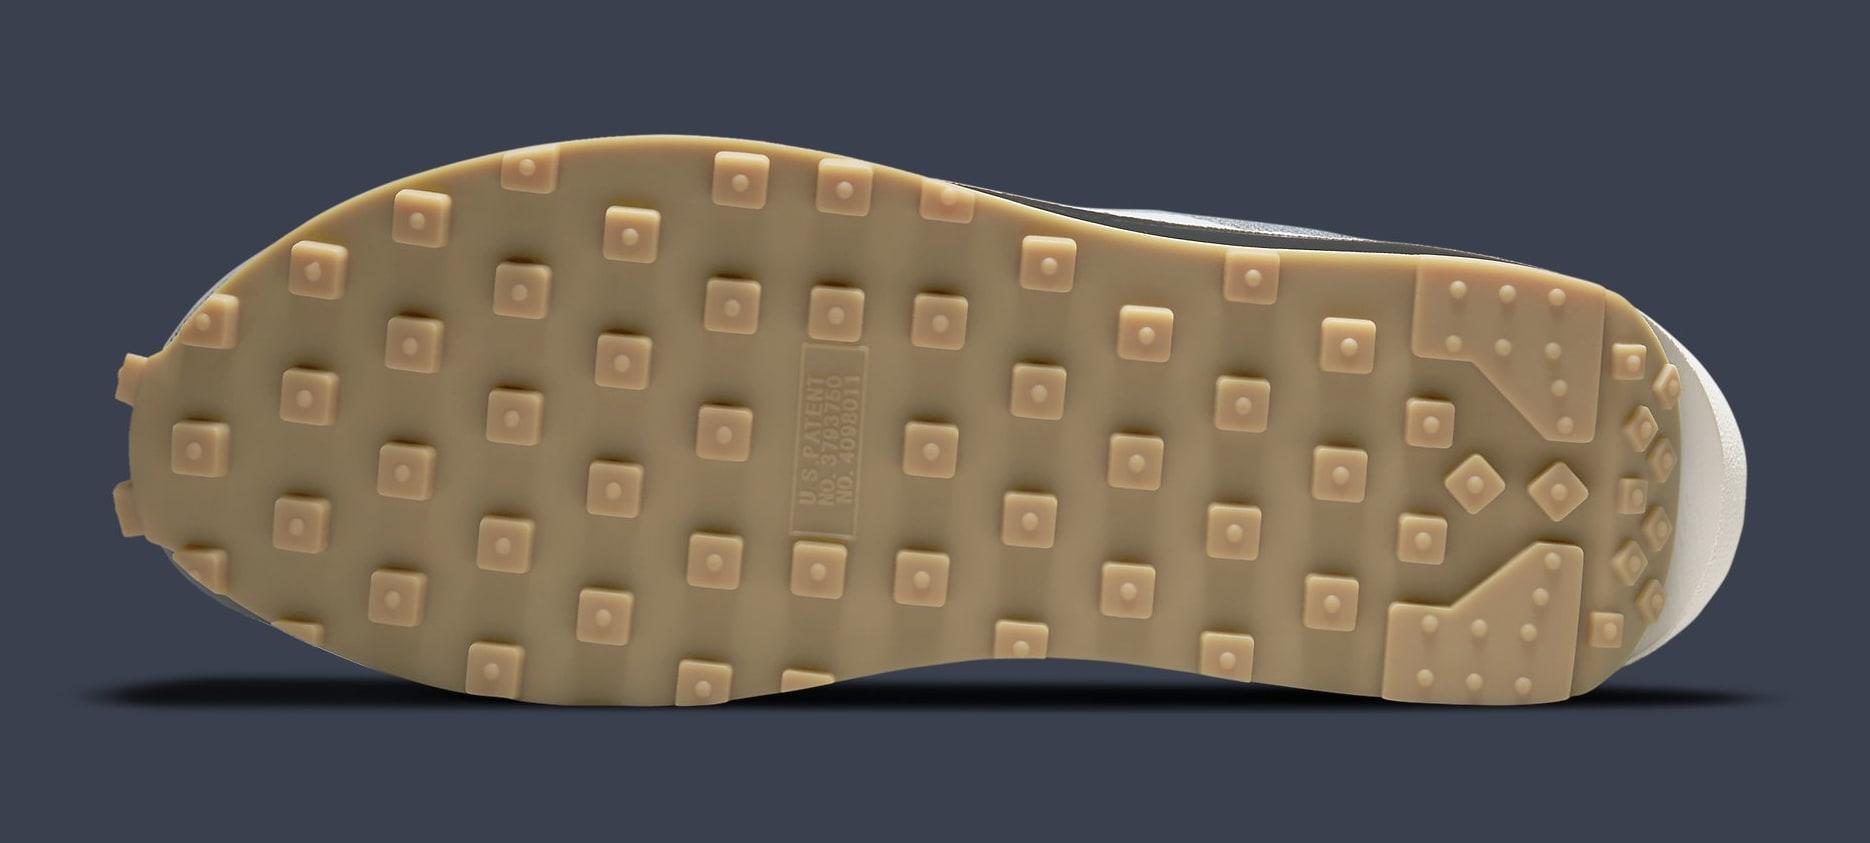 Clot x Sacai x Nike LDWaffle 'Cool Grey' DH3114-001 Outsole